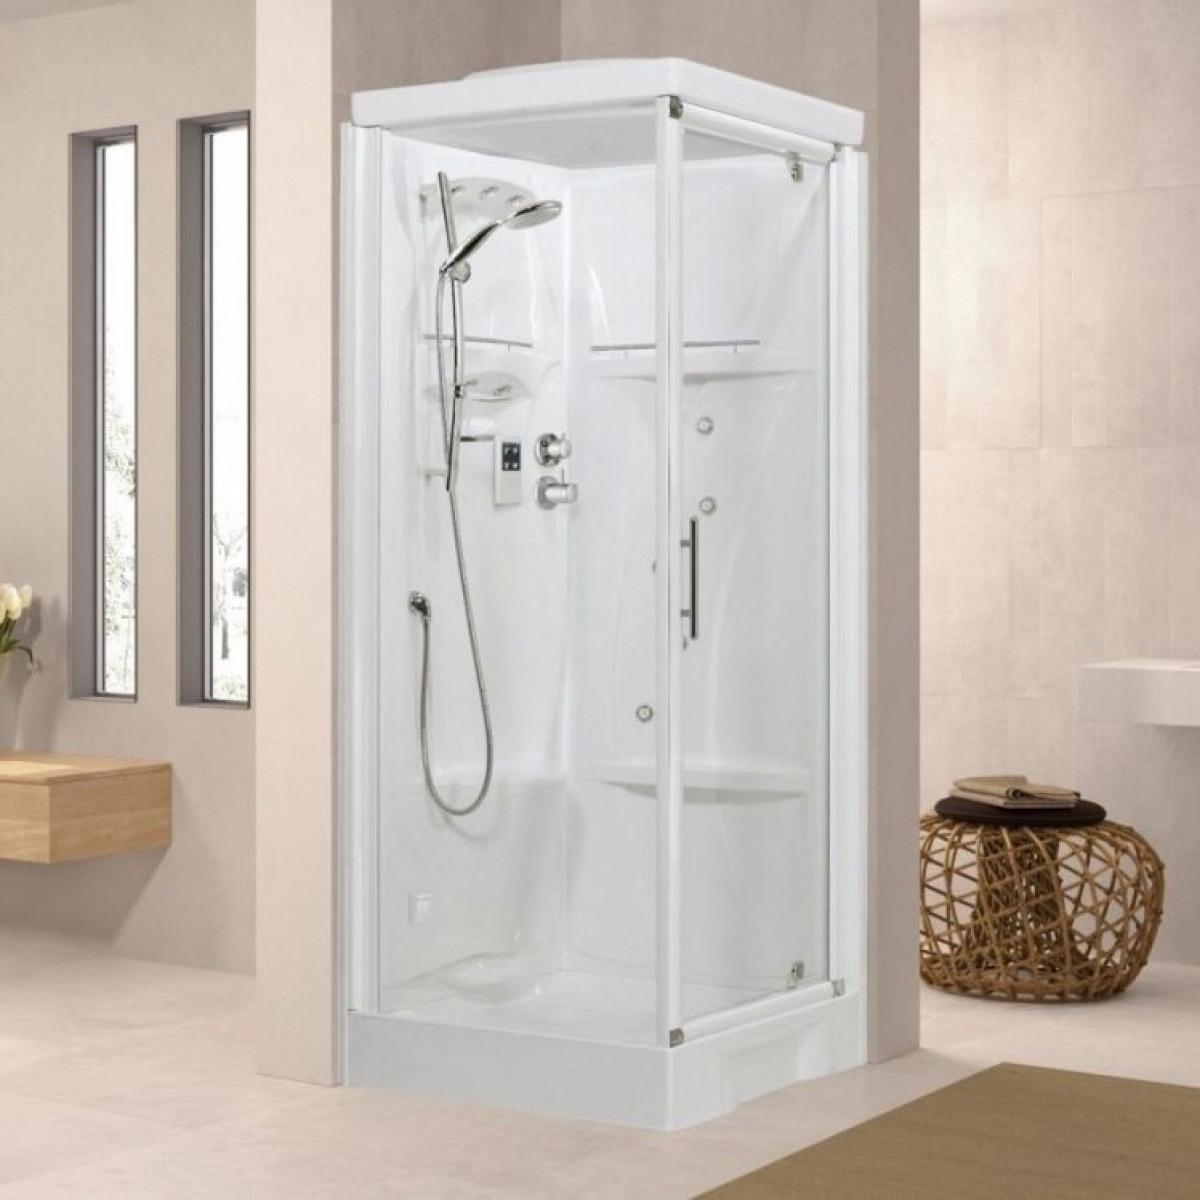 Novellini new holiday gf80 800mm pivot door panel steam for Novellini shower doors